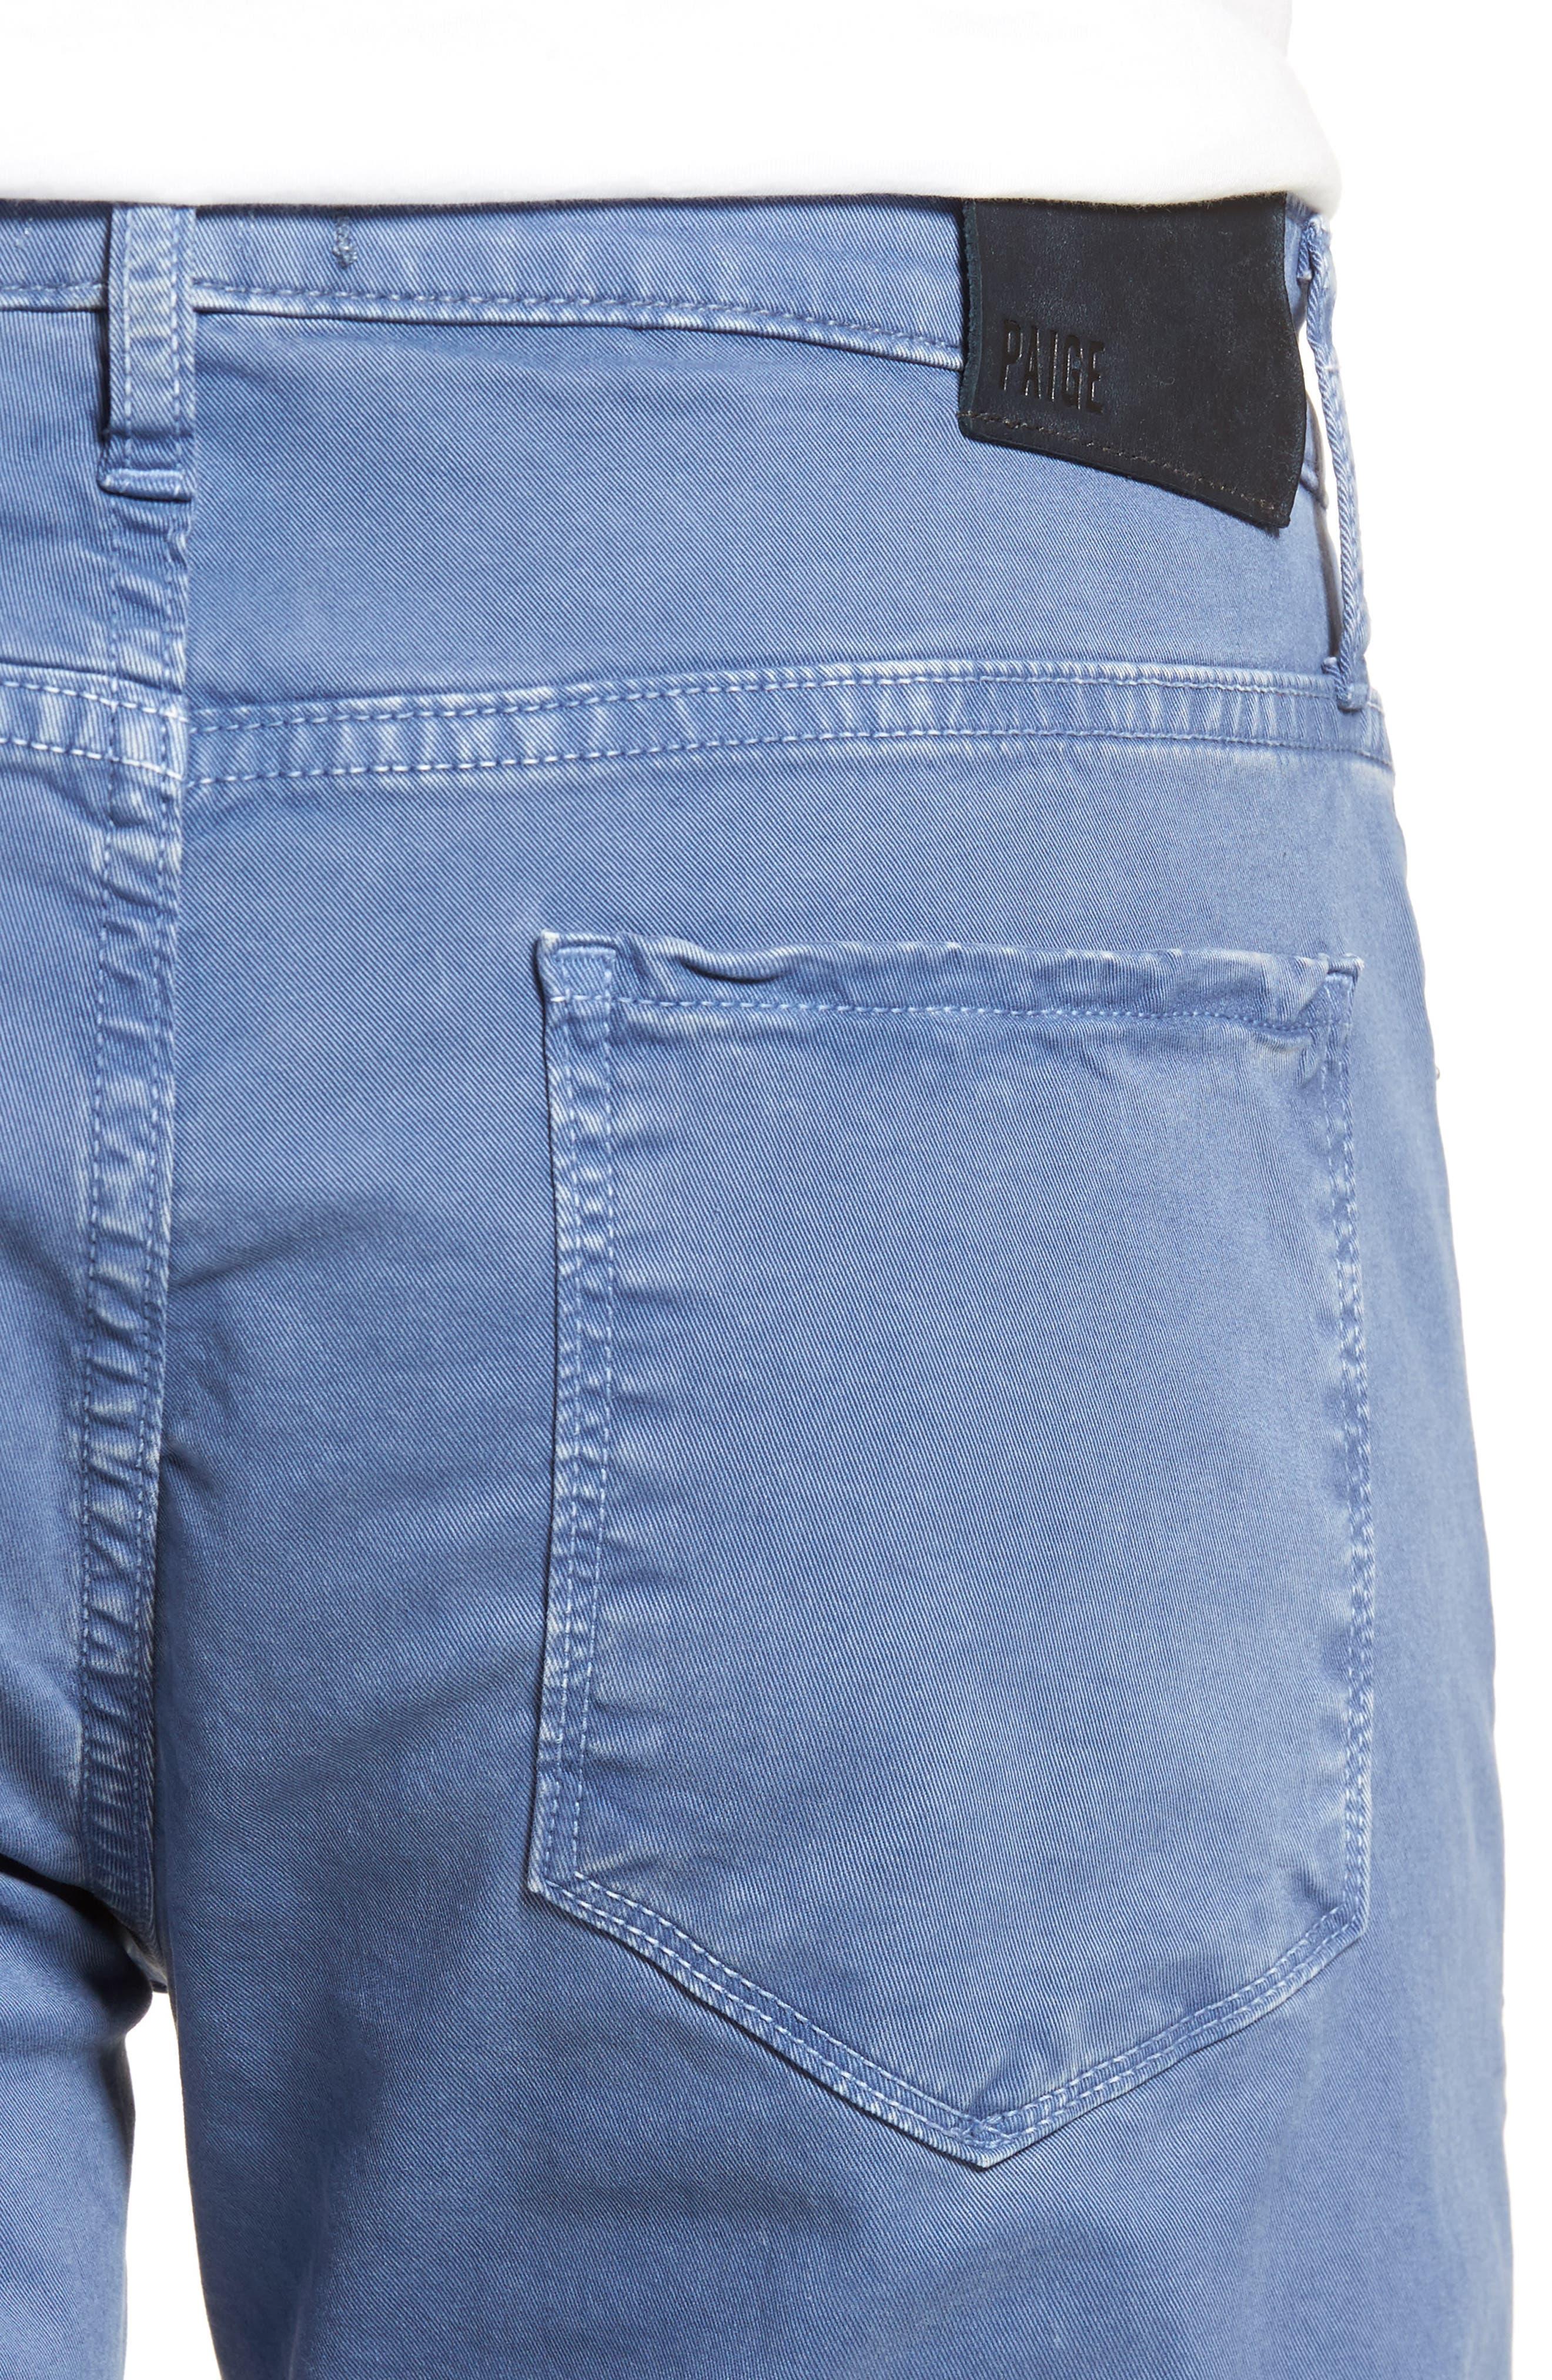 Lennox Slim Fit Five-Pocket Pants,                             Alternate thumbnail 4, color,                             Vintage Mariner